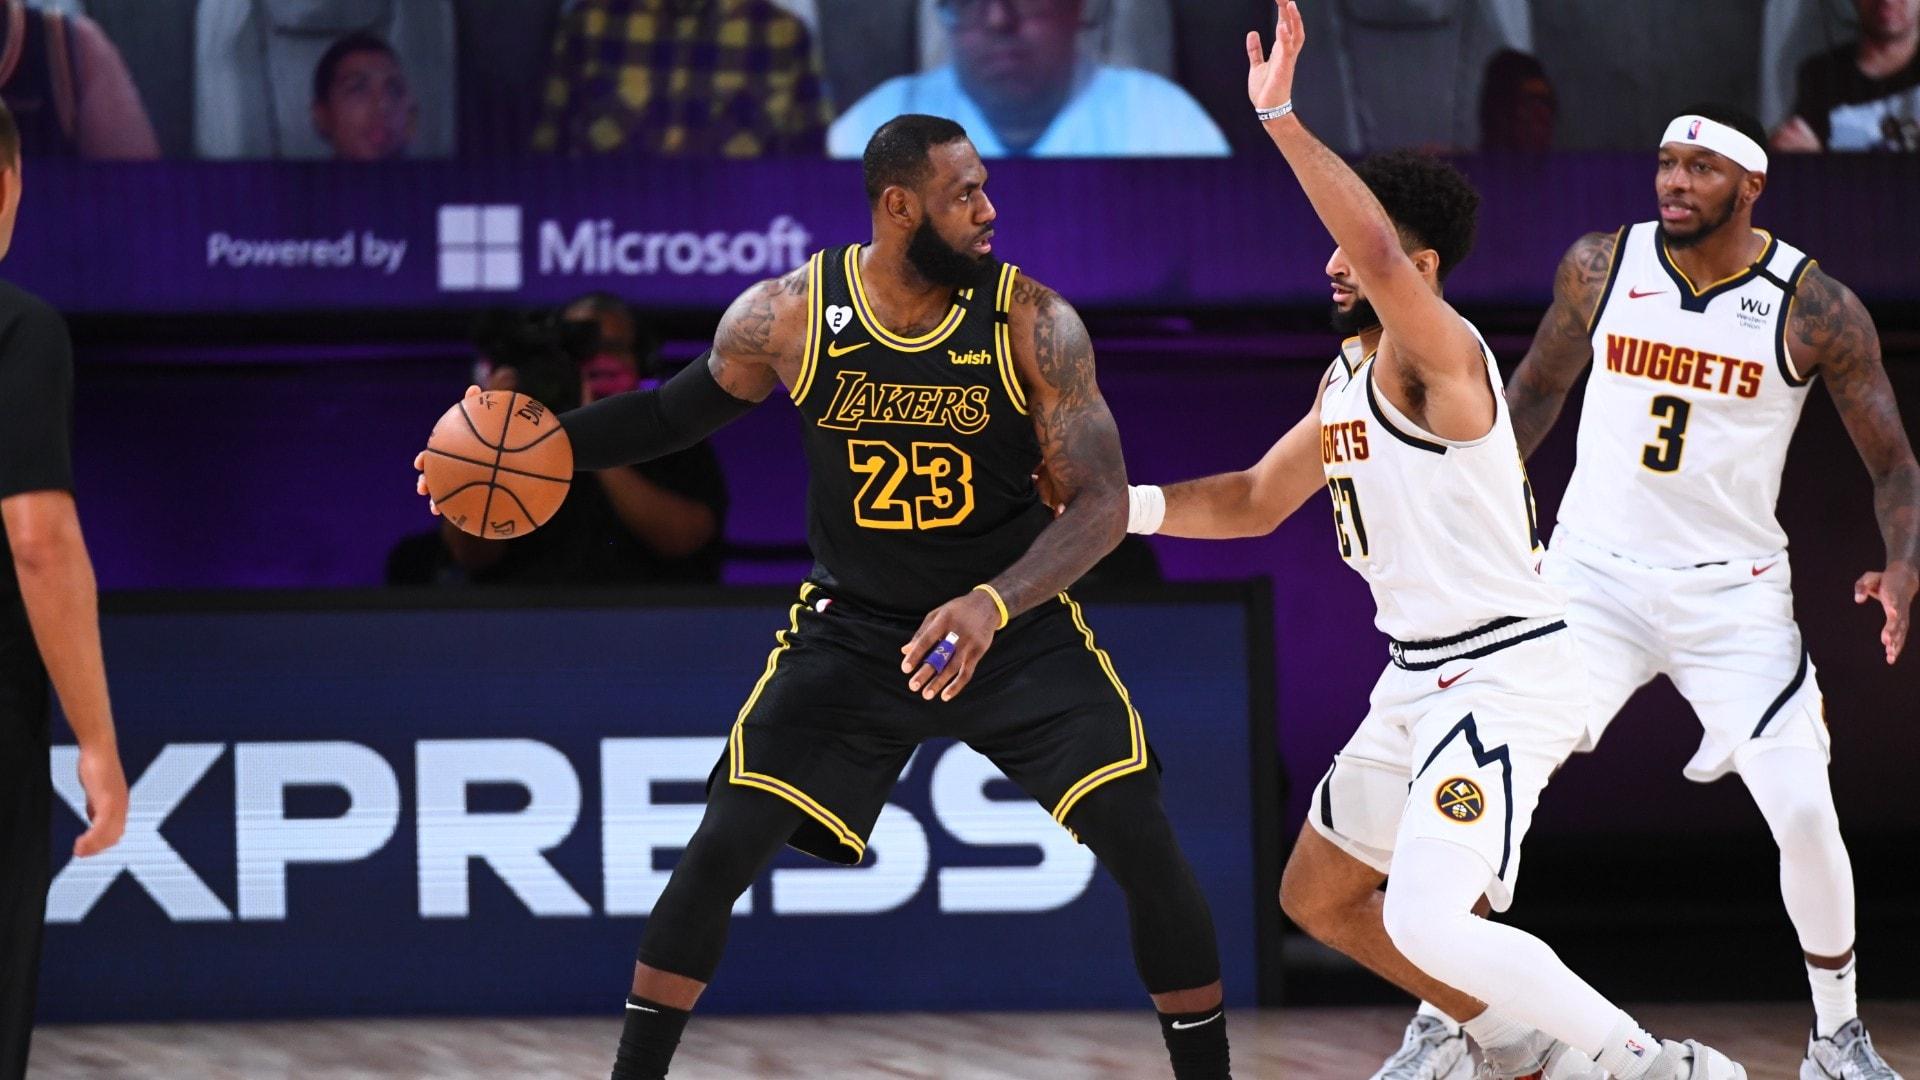 Lakers Edge Nuggets, Take 2-0 Lead